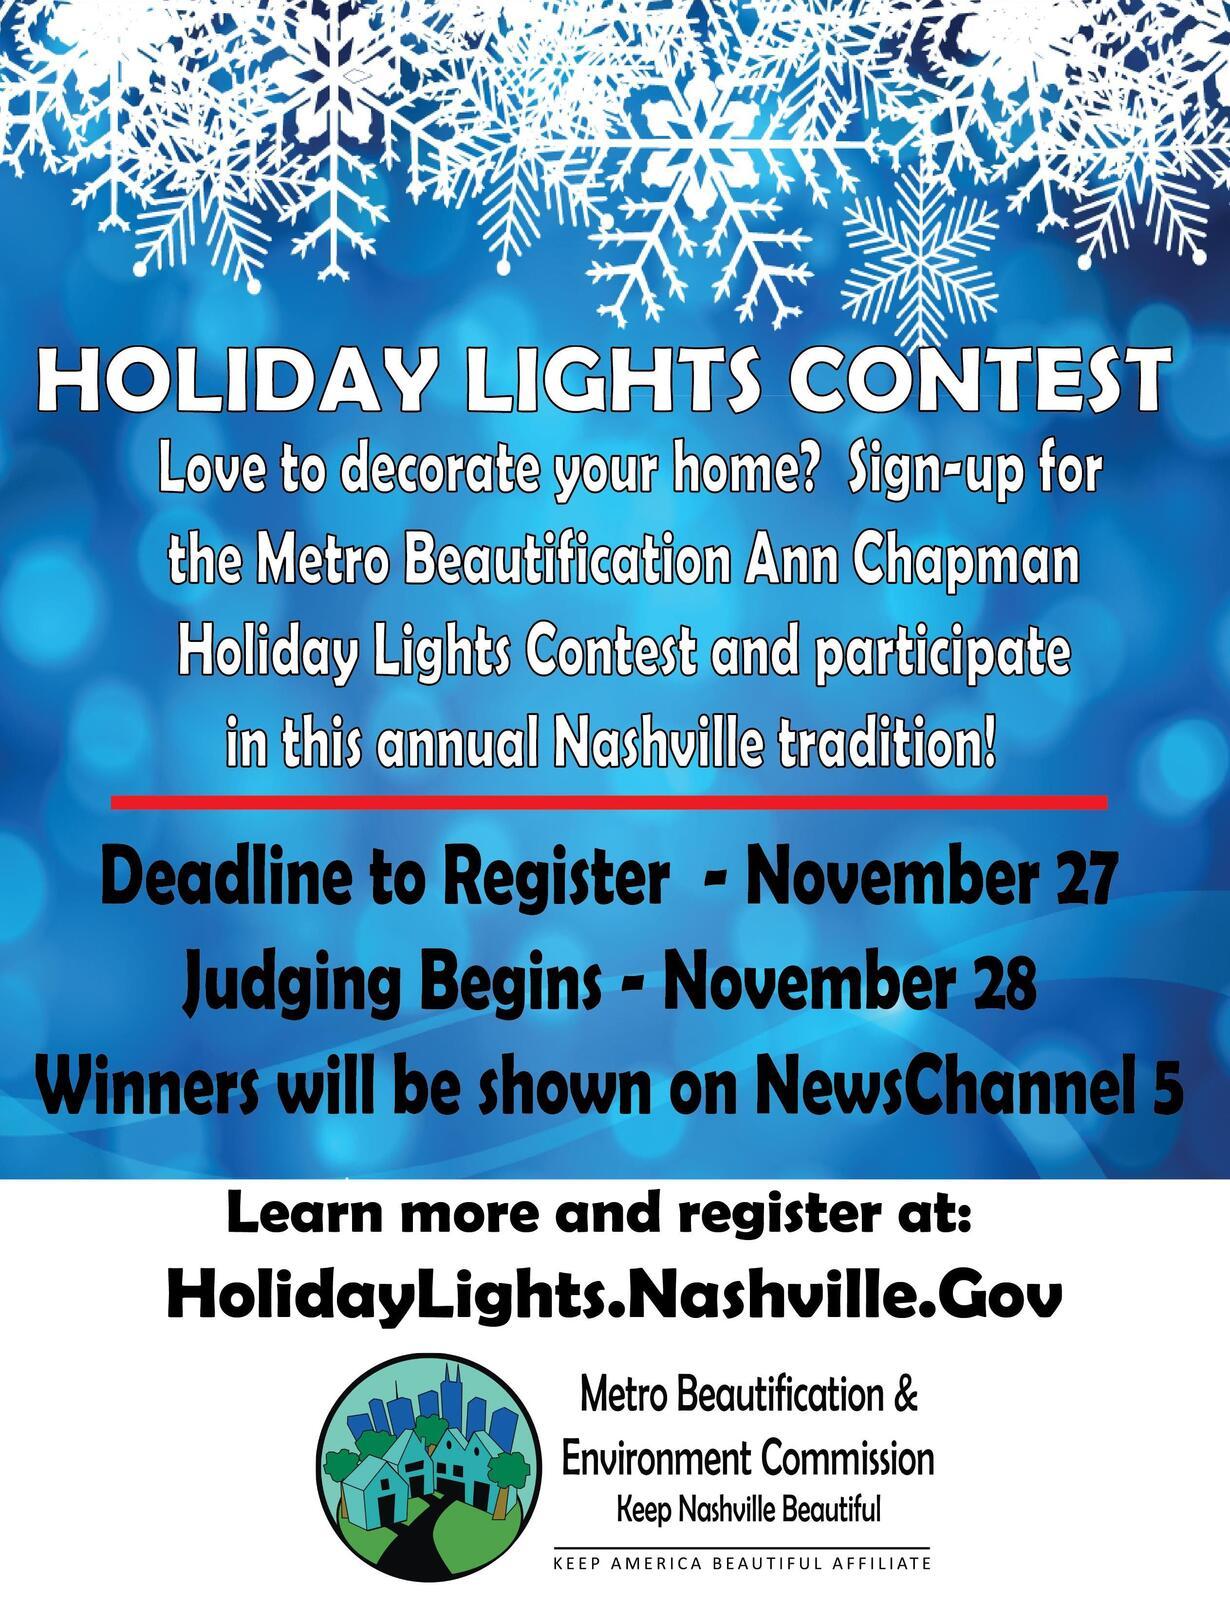 2016 Ann Chapman Holiday Lights Contes (Metro Nashville